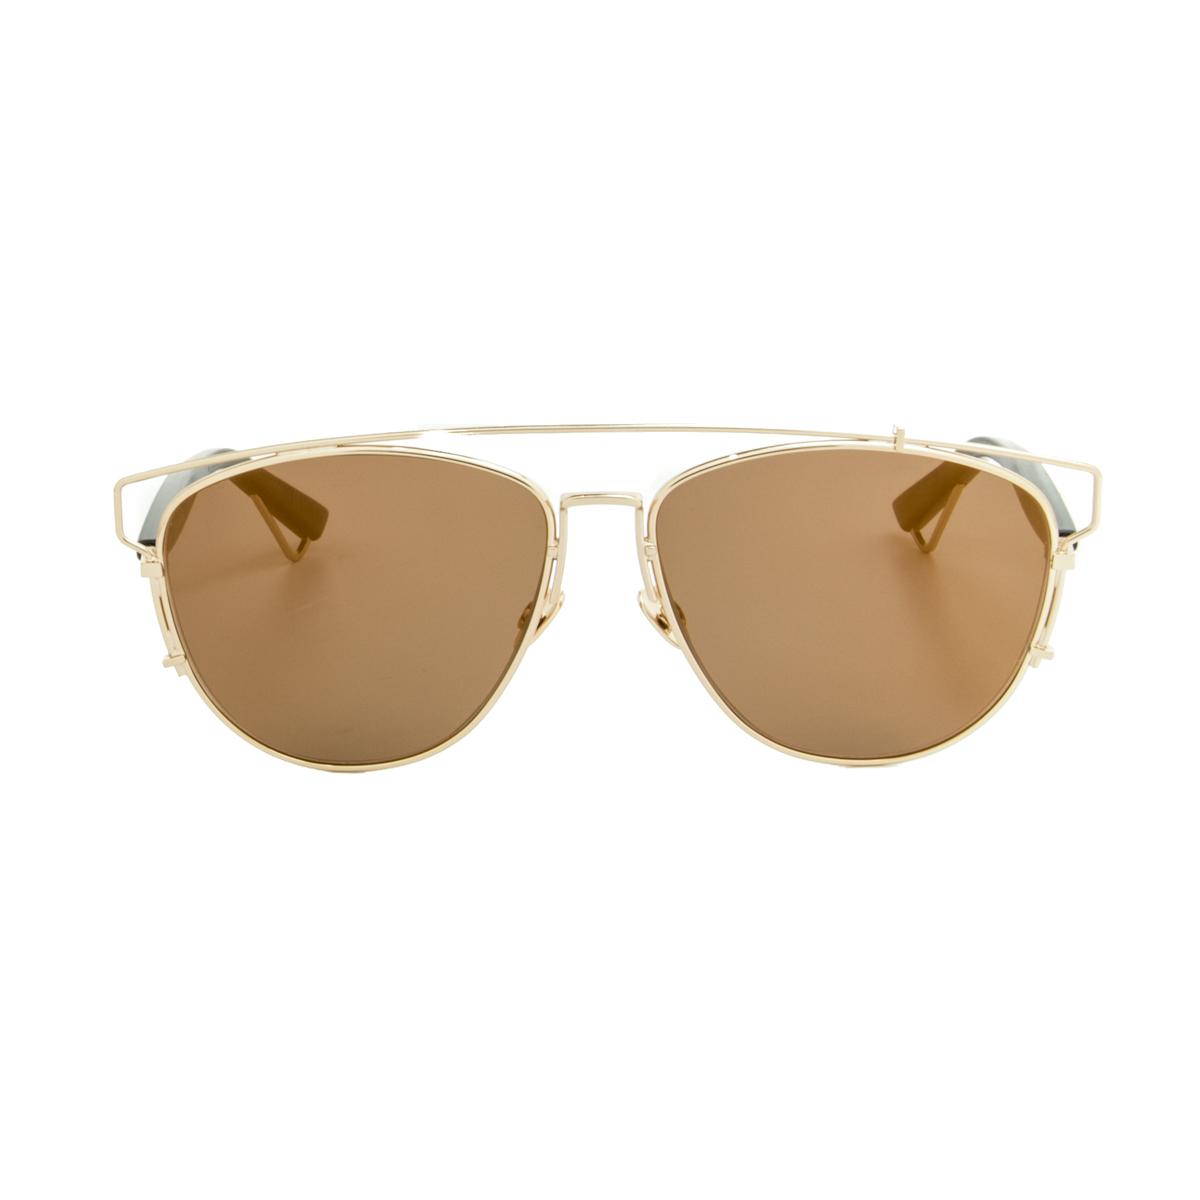 225531365de Dior Sunglasses Sale Ebay